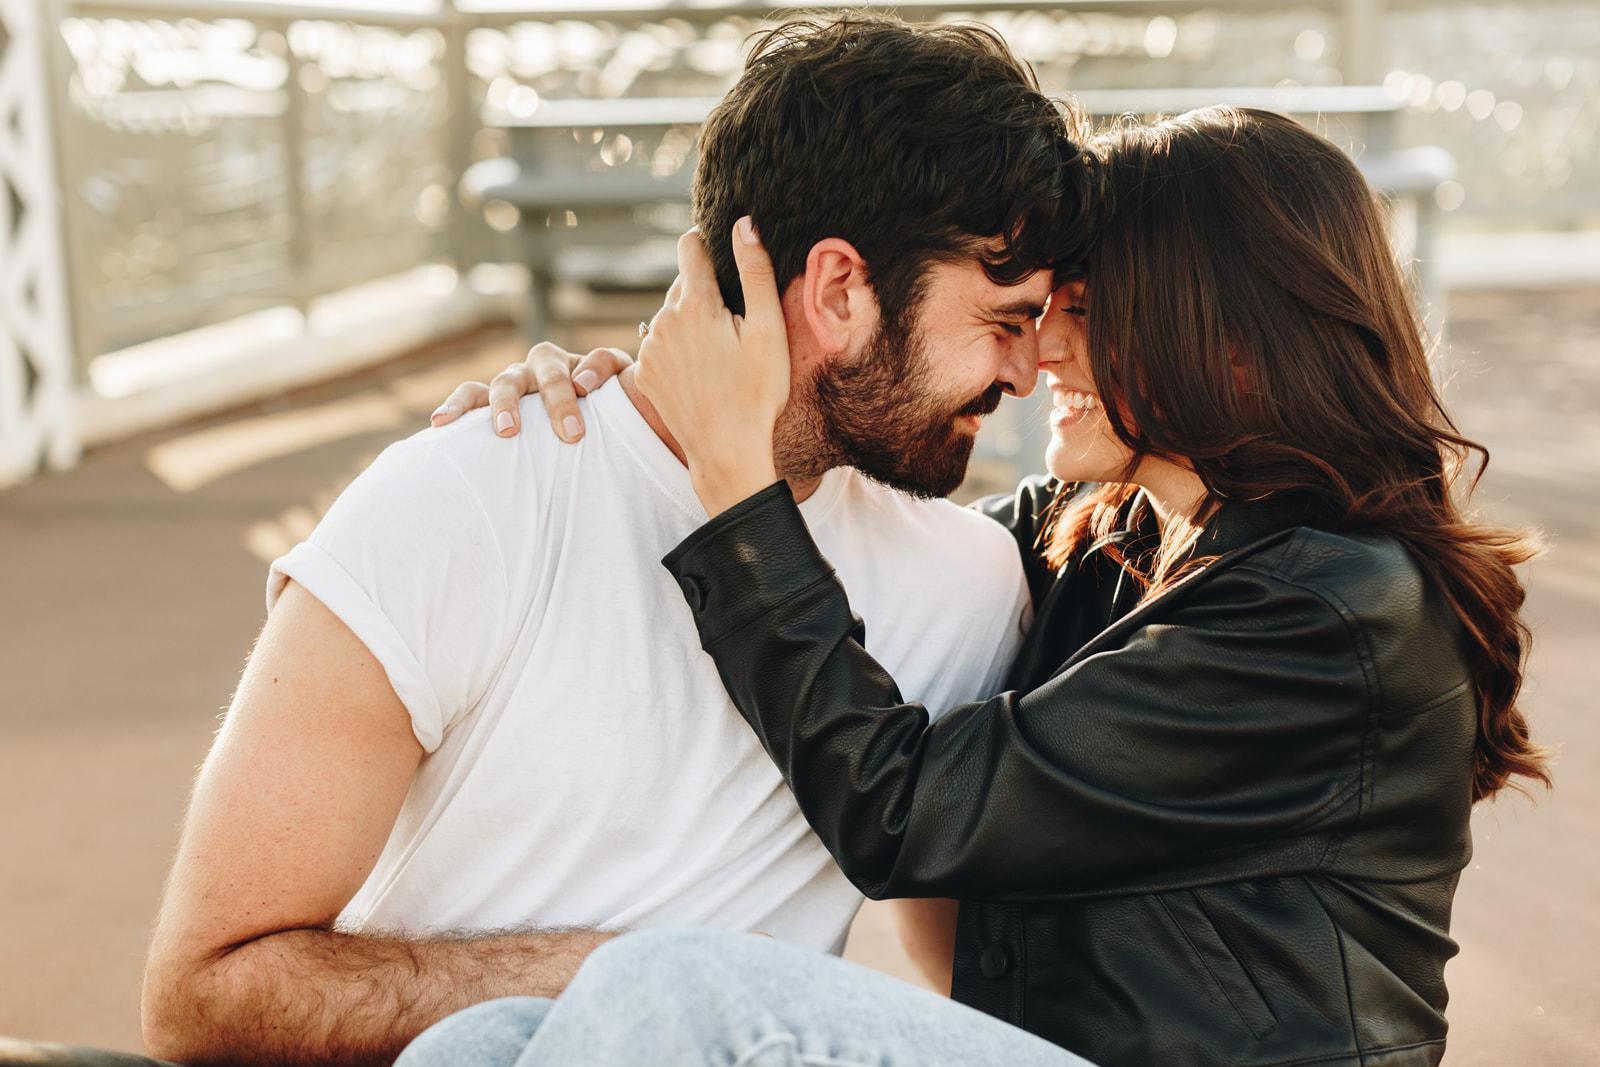 Sydney dating blog